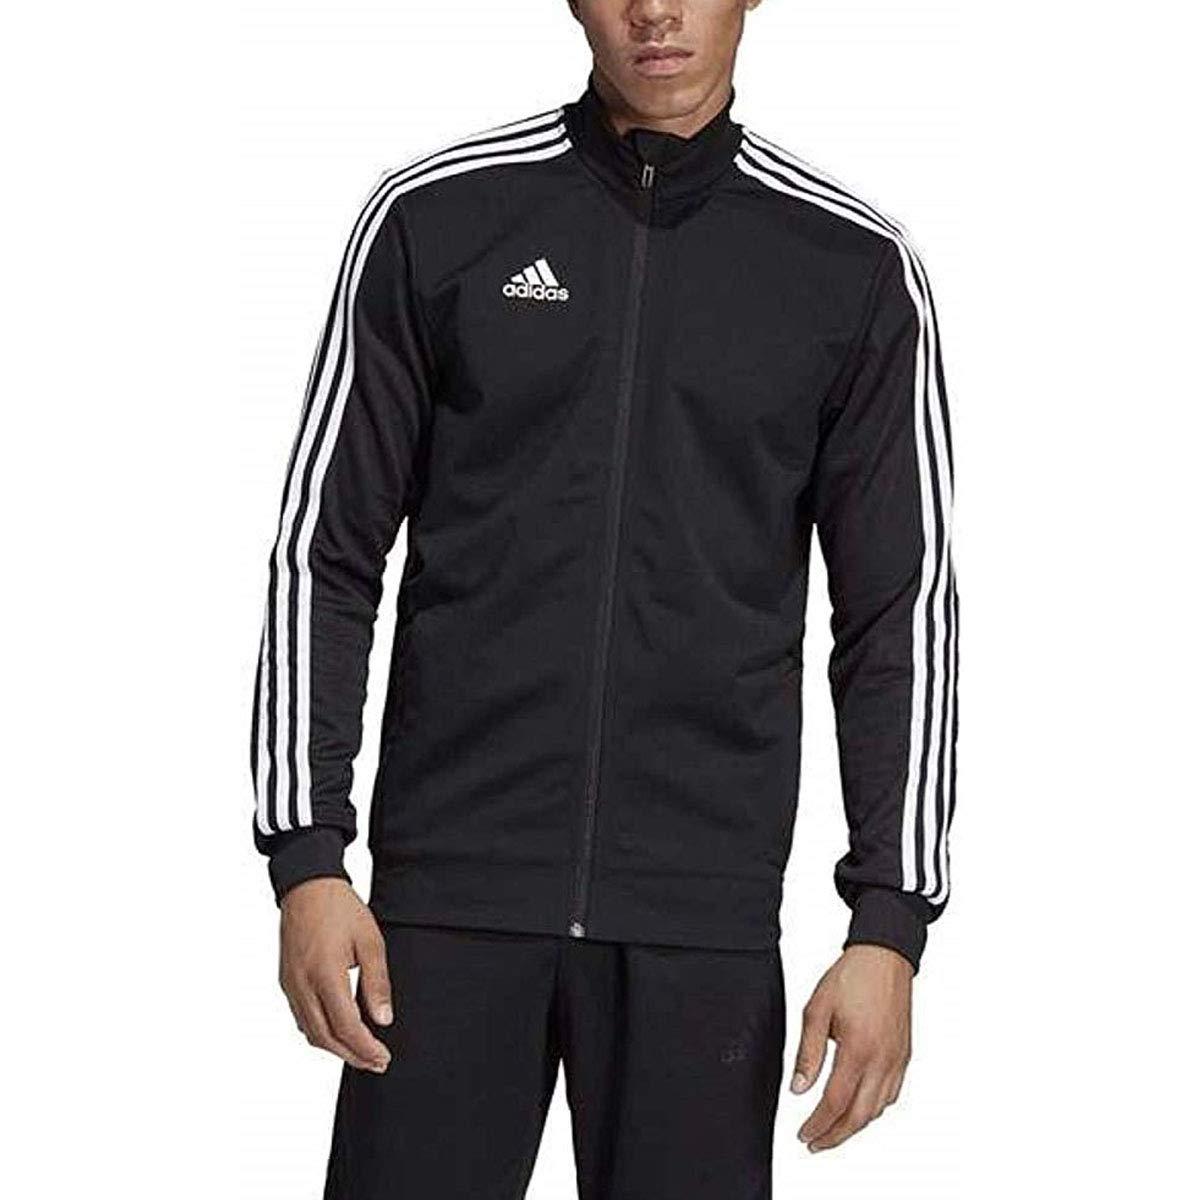 adidas Men's Tiro 19 Track Suit (S Jacket/L Pants, Grey/White) by adidas